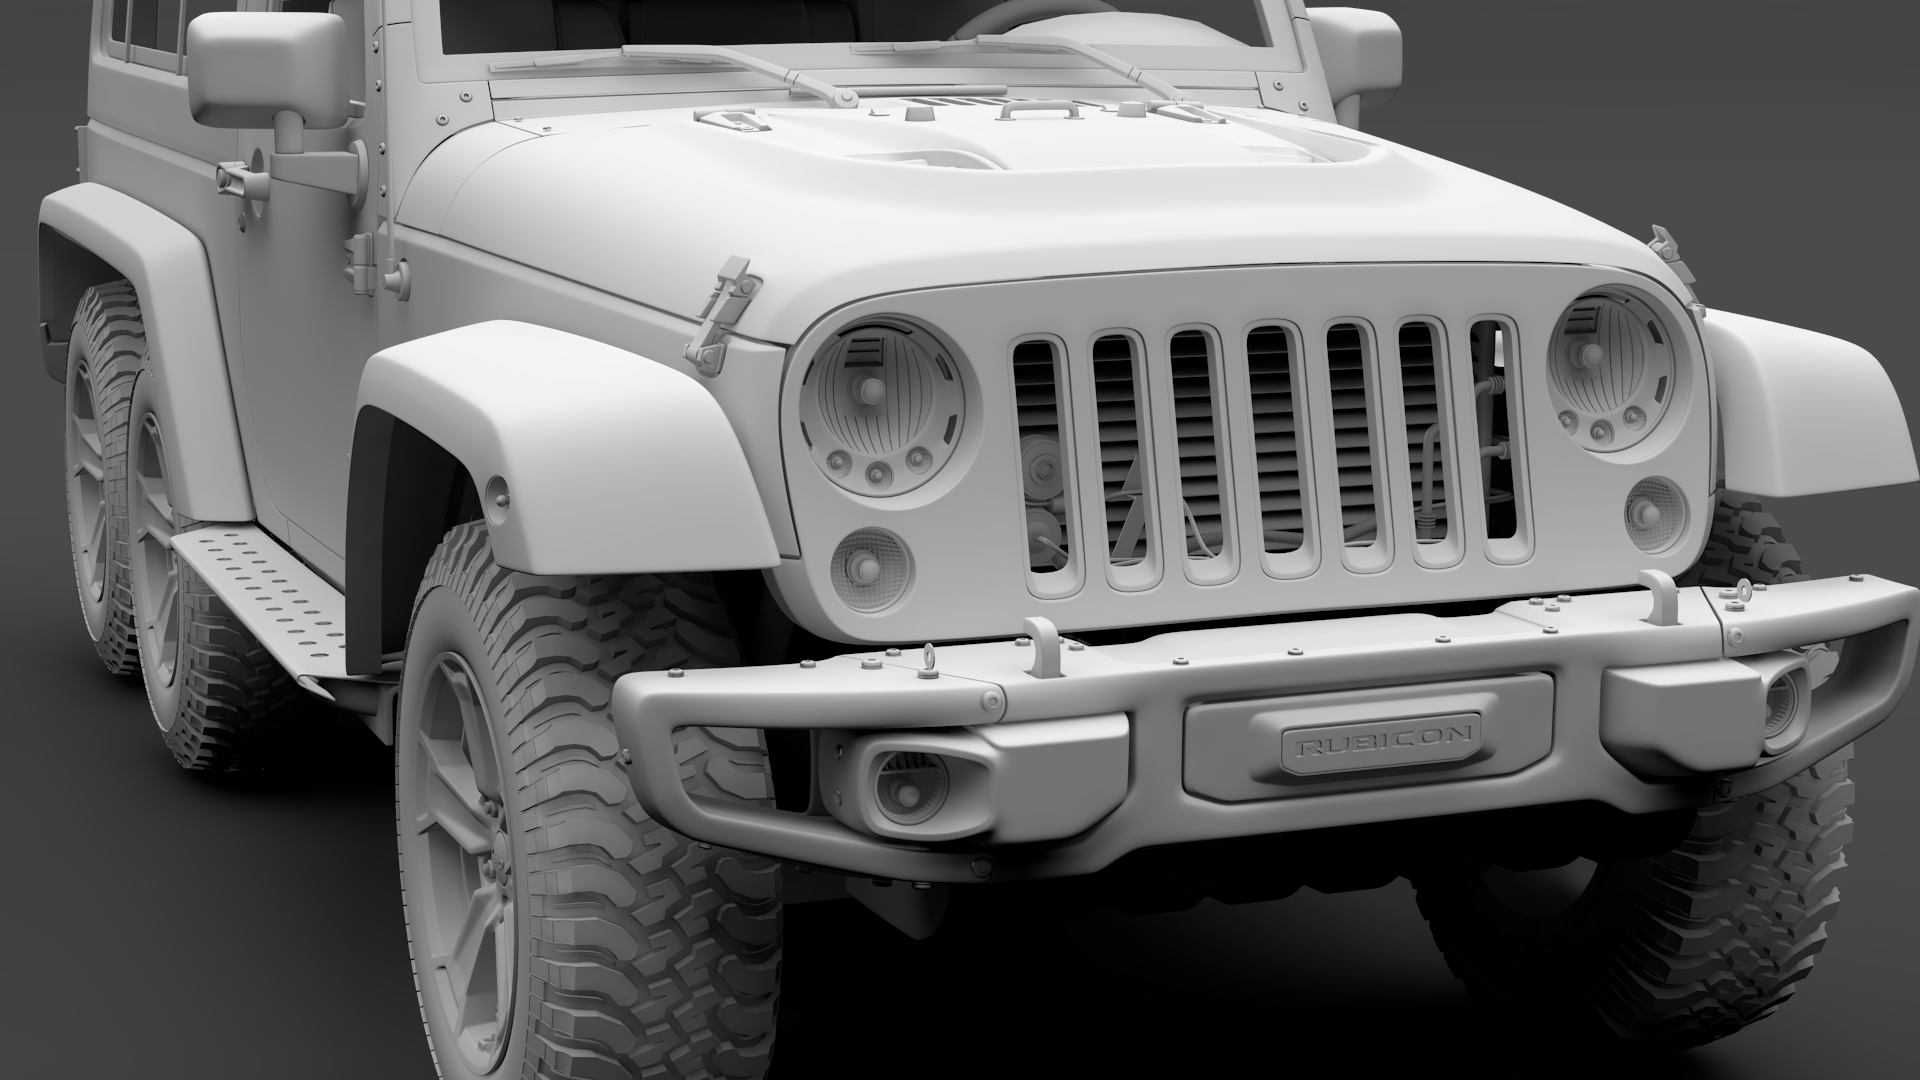 jeep wrangler 6×6 rubicon recon jk 2017 3d model max fbx c4d lwo ma mb hrc xsi obj 276858